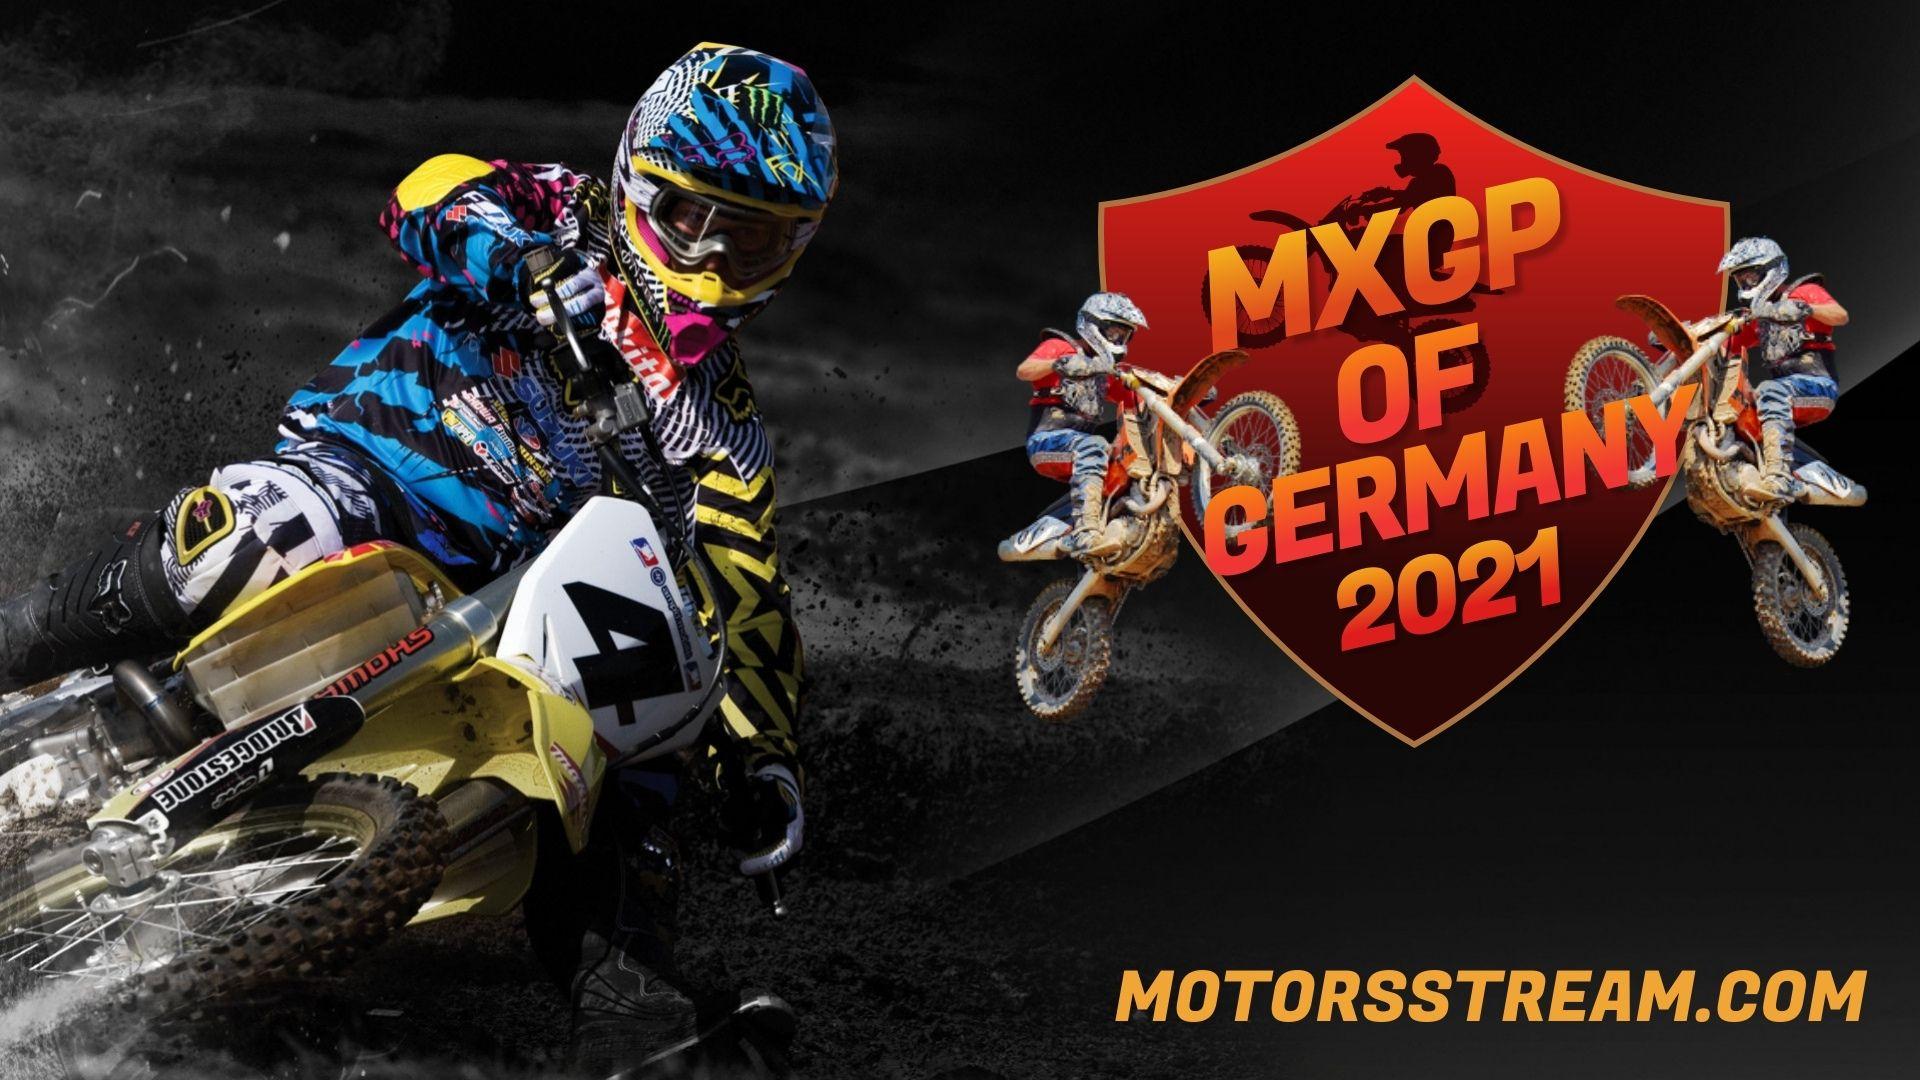 FIM Motocross WC Germany Live Stream 2021 | MXGP